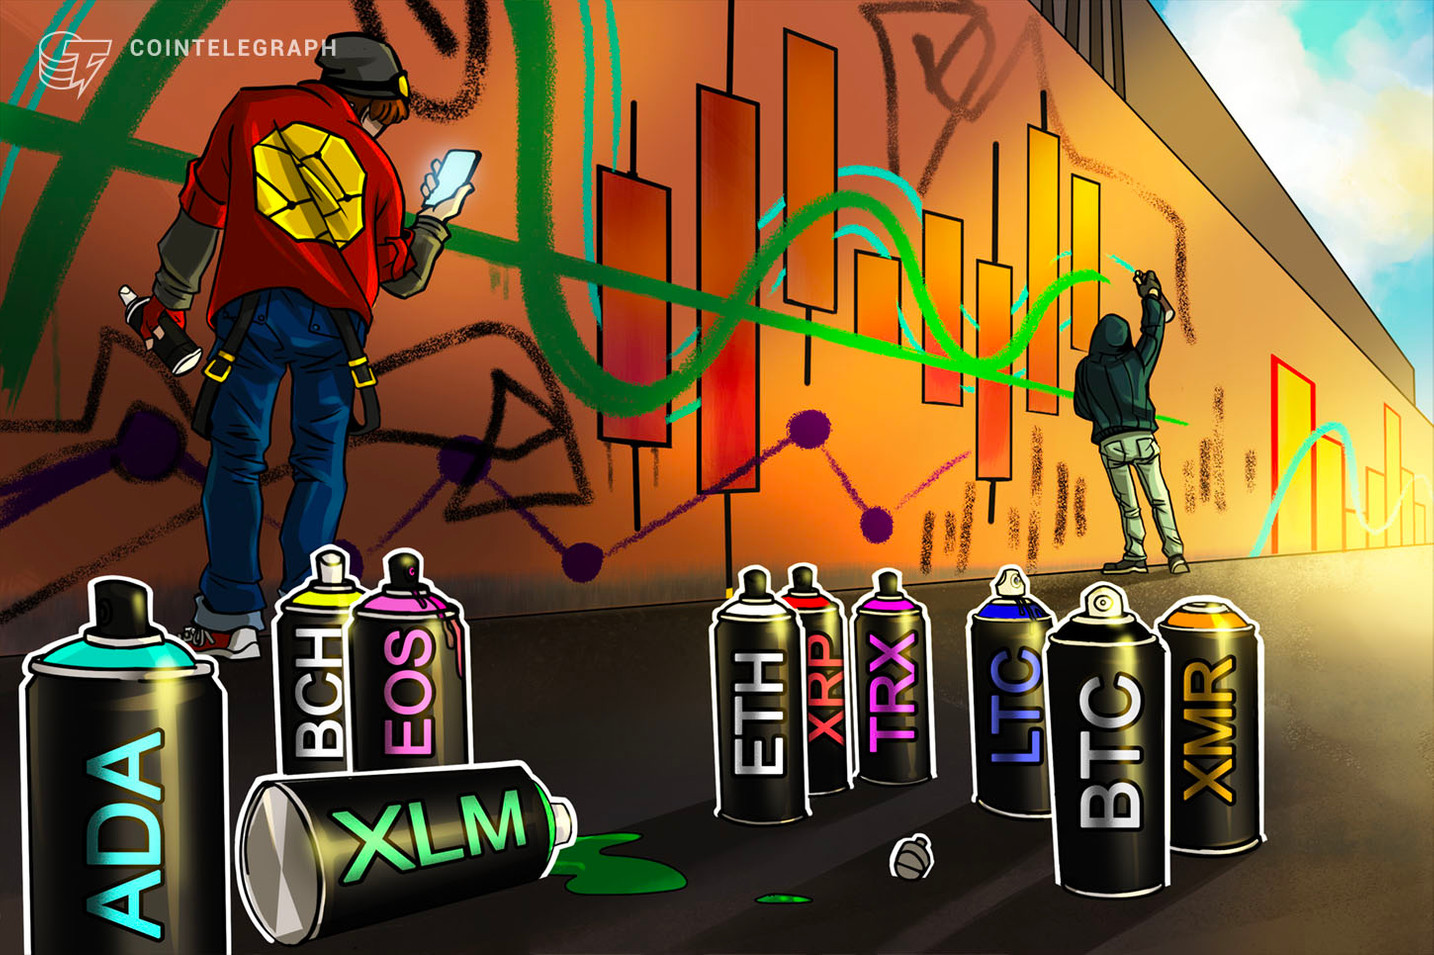 Kursanalyse, 15. Oktober: Bitcoin, Ethereum, Ripple, Bitcoin Cash, EOS, Stellar, Litecoin, Cardano, Monero, TRON